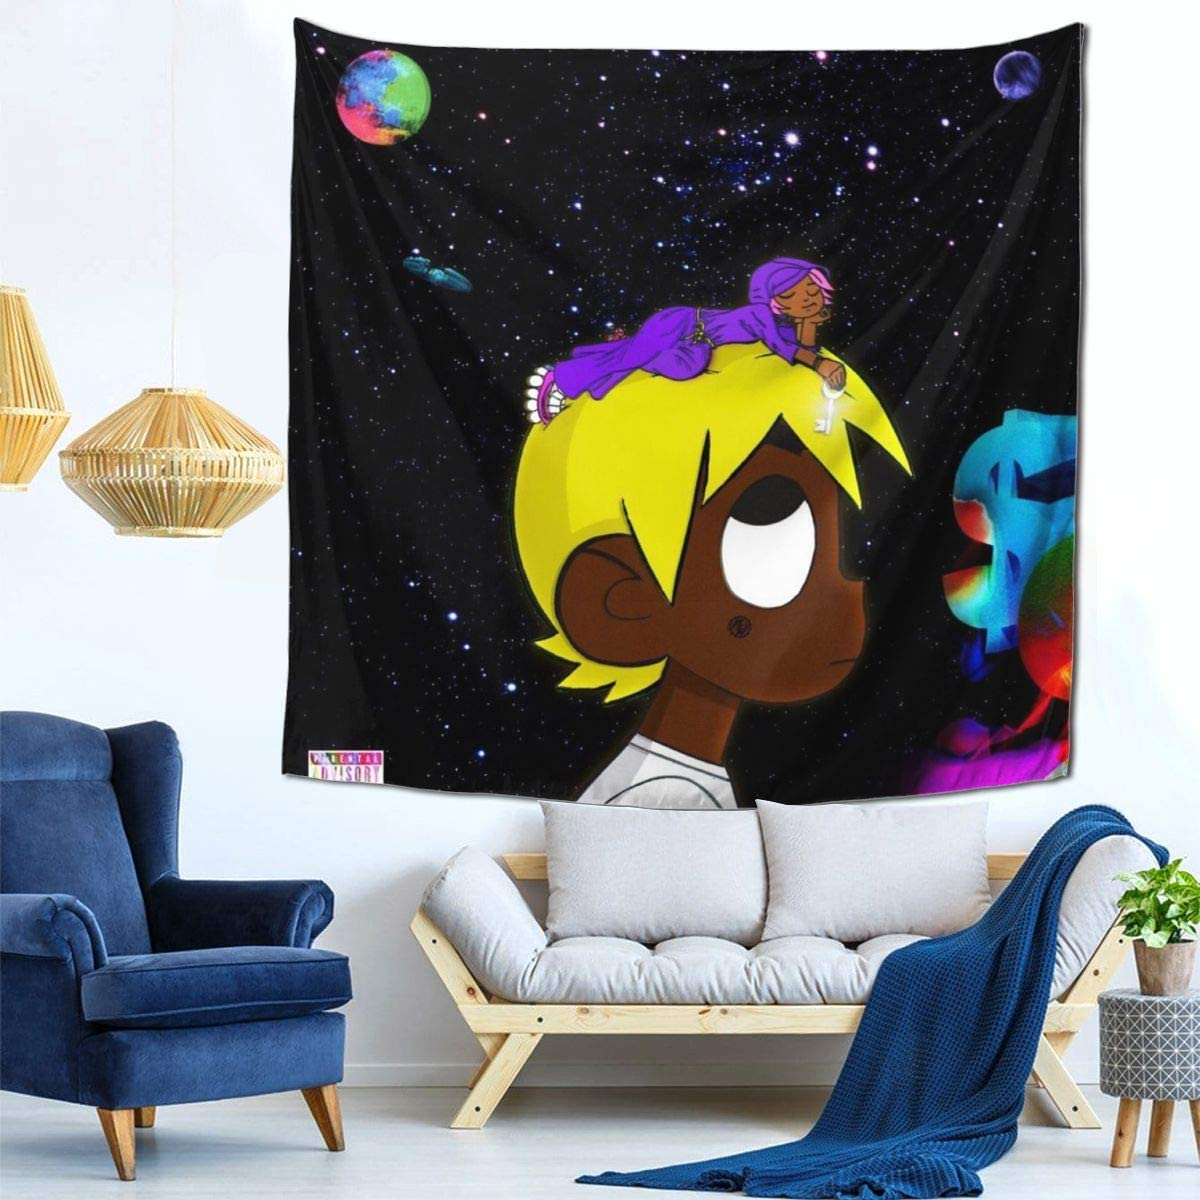 Print Gift Lil-Uzi vert Vs The World Album Tapestry Cover Canvas Poster Home Decor Modern Idea 59×59 Inch